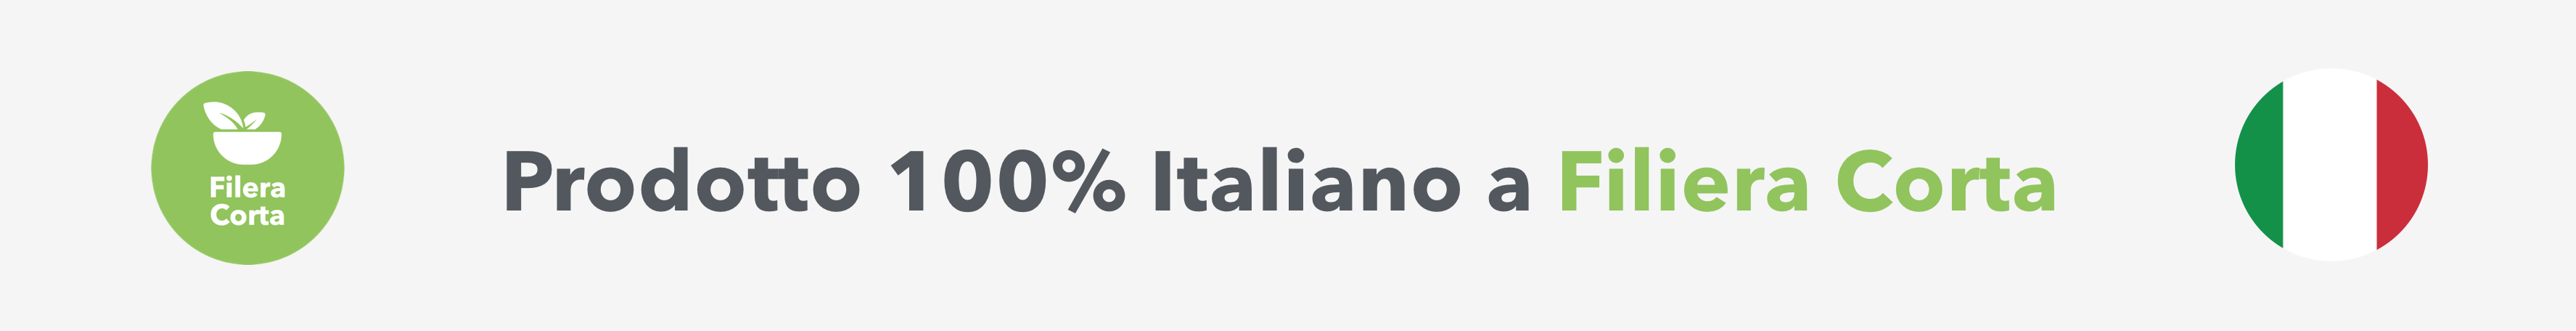 Patate Italiane a Filiera corta ideali da friggere